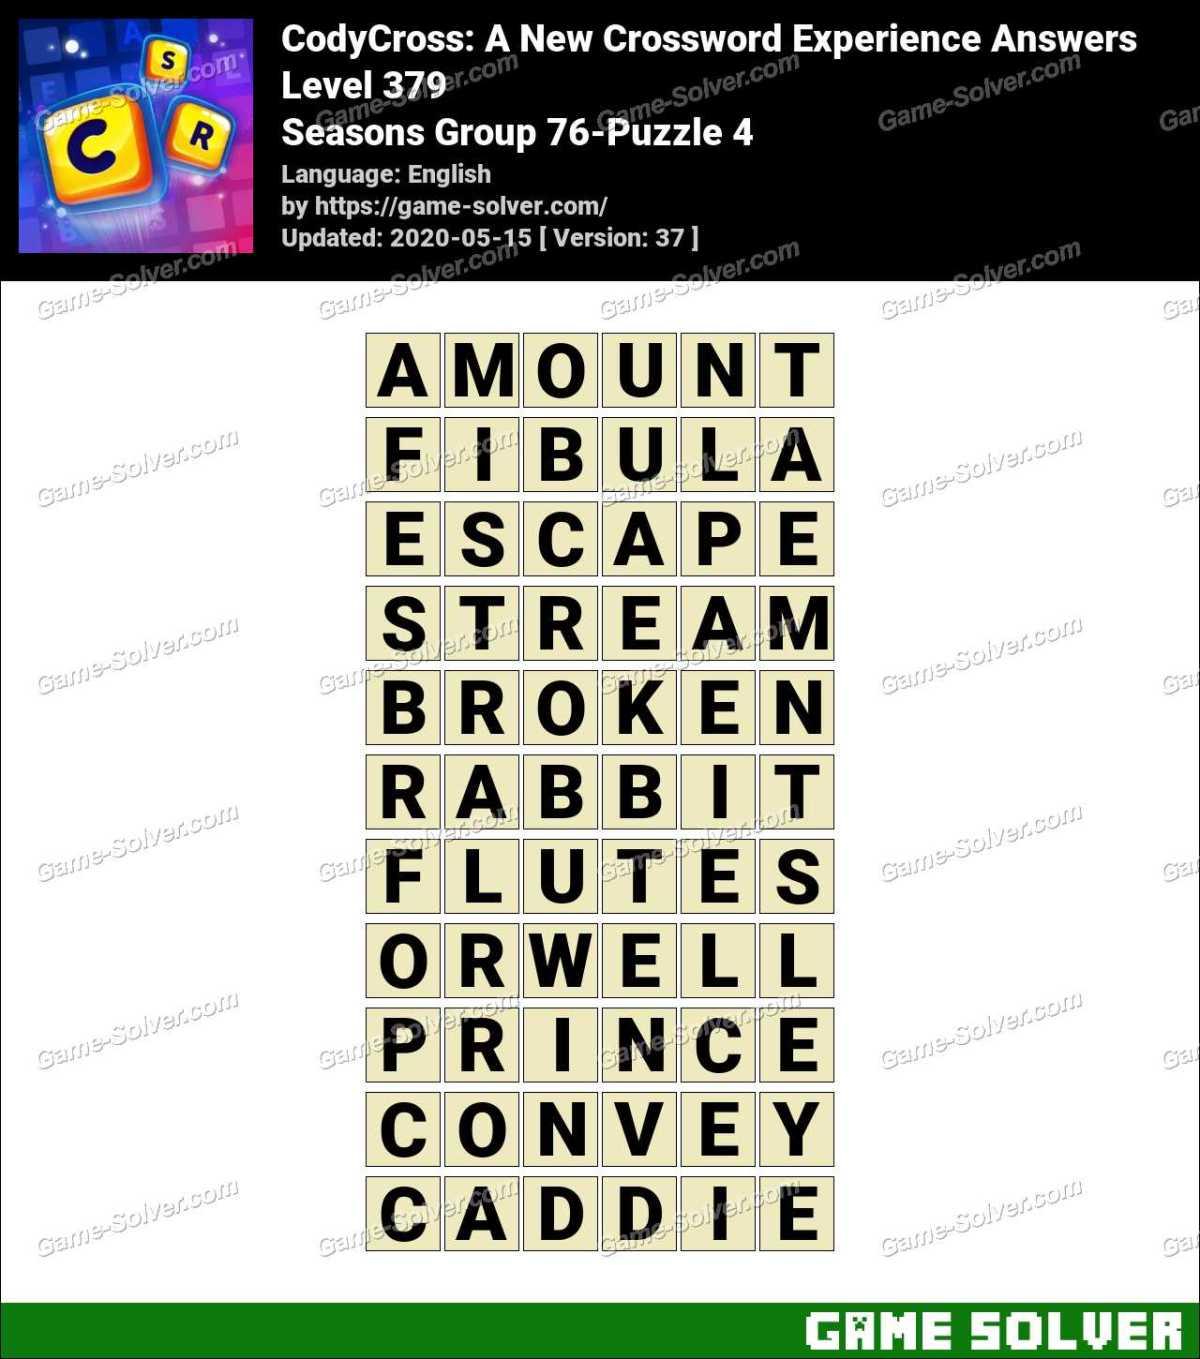 CodyCross Seasons Group 76-Puzzle 4 Answers